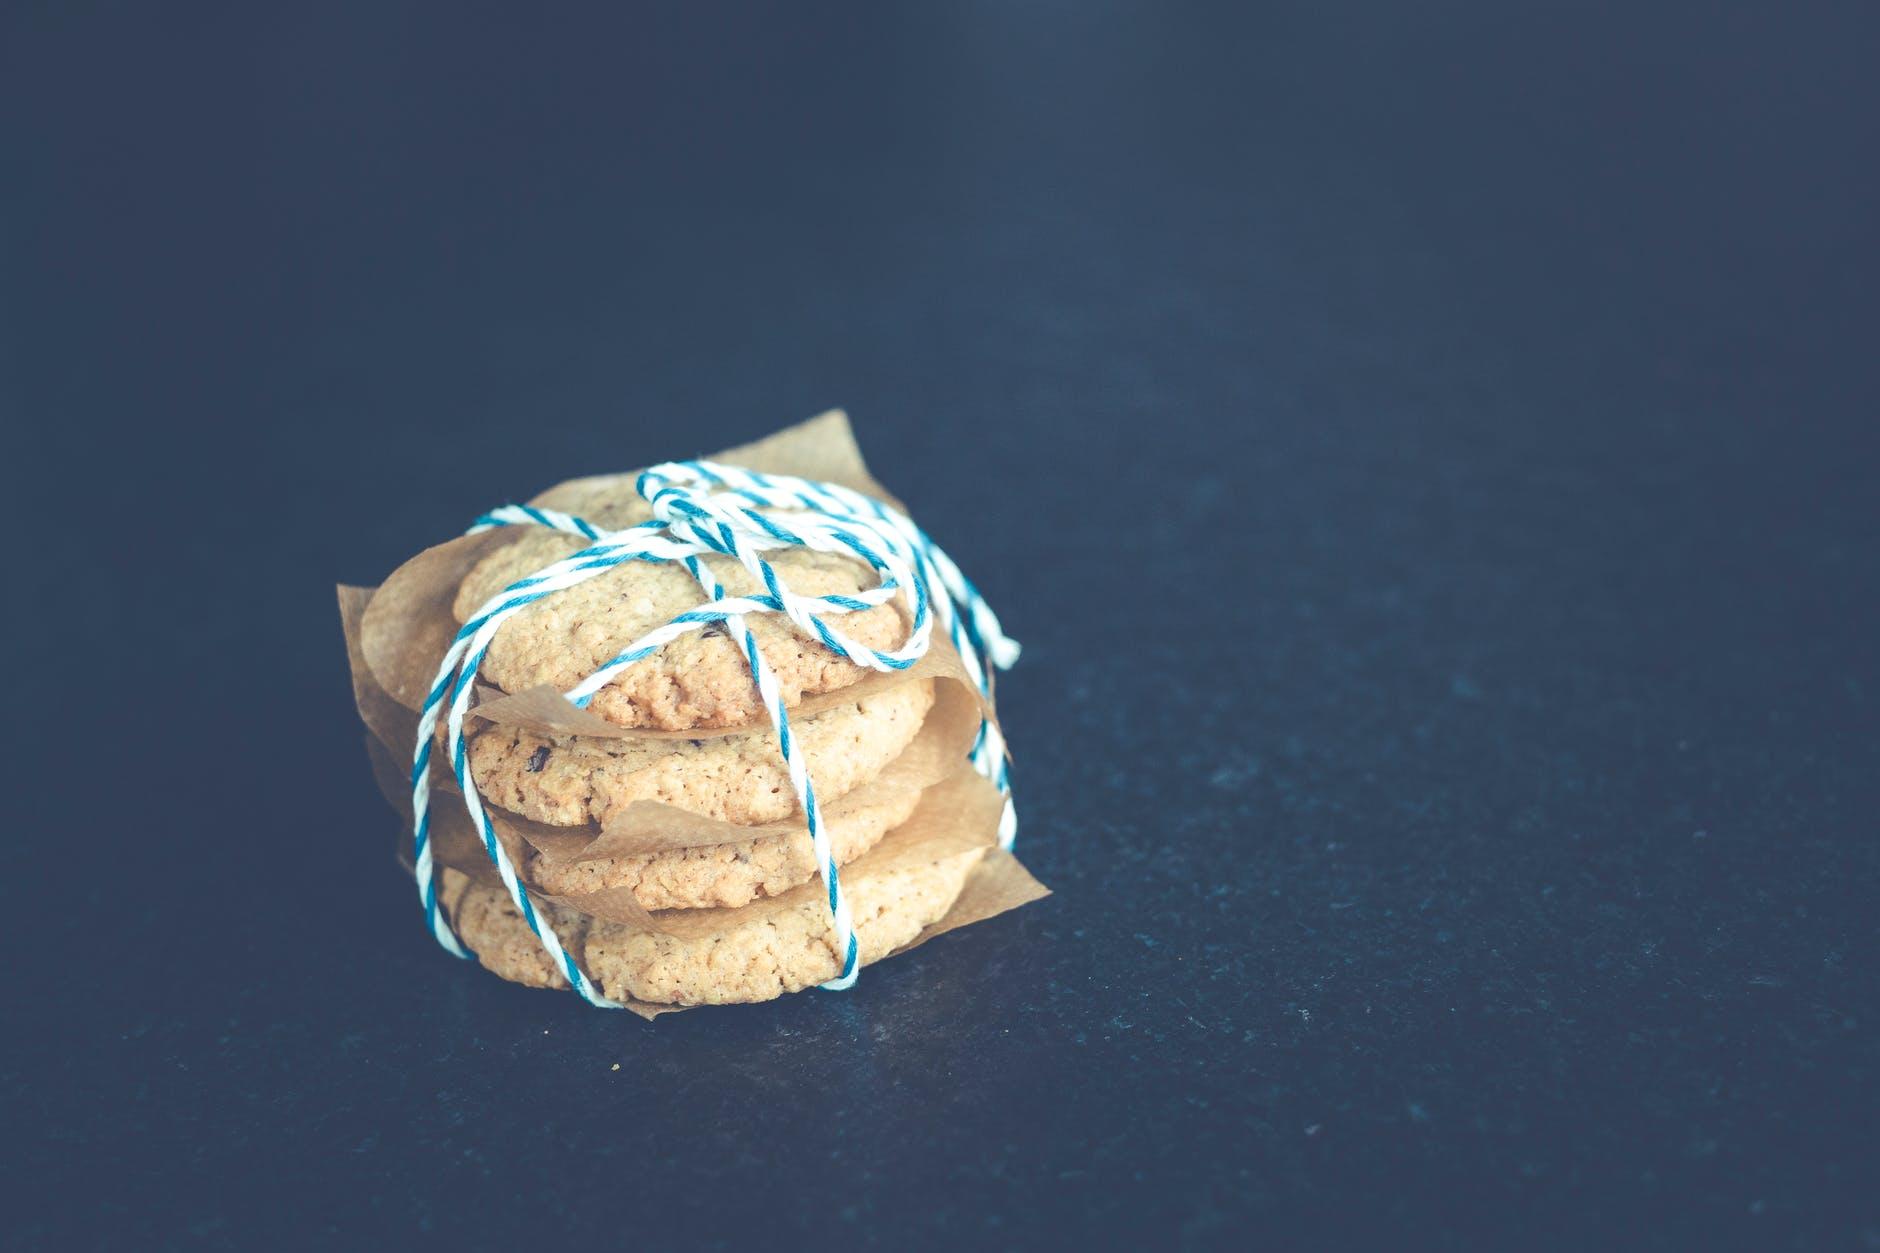 round pastries pack